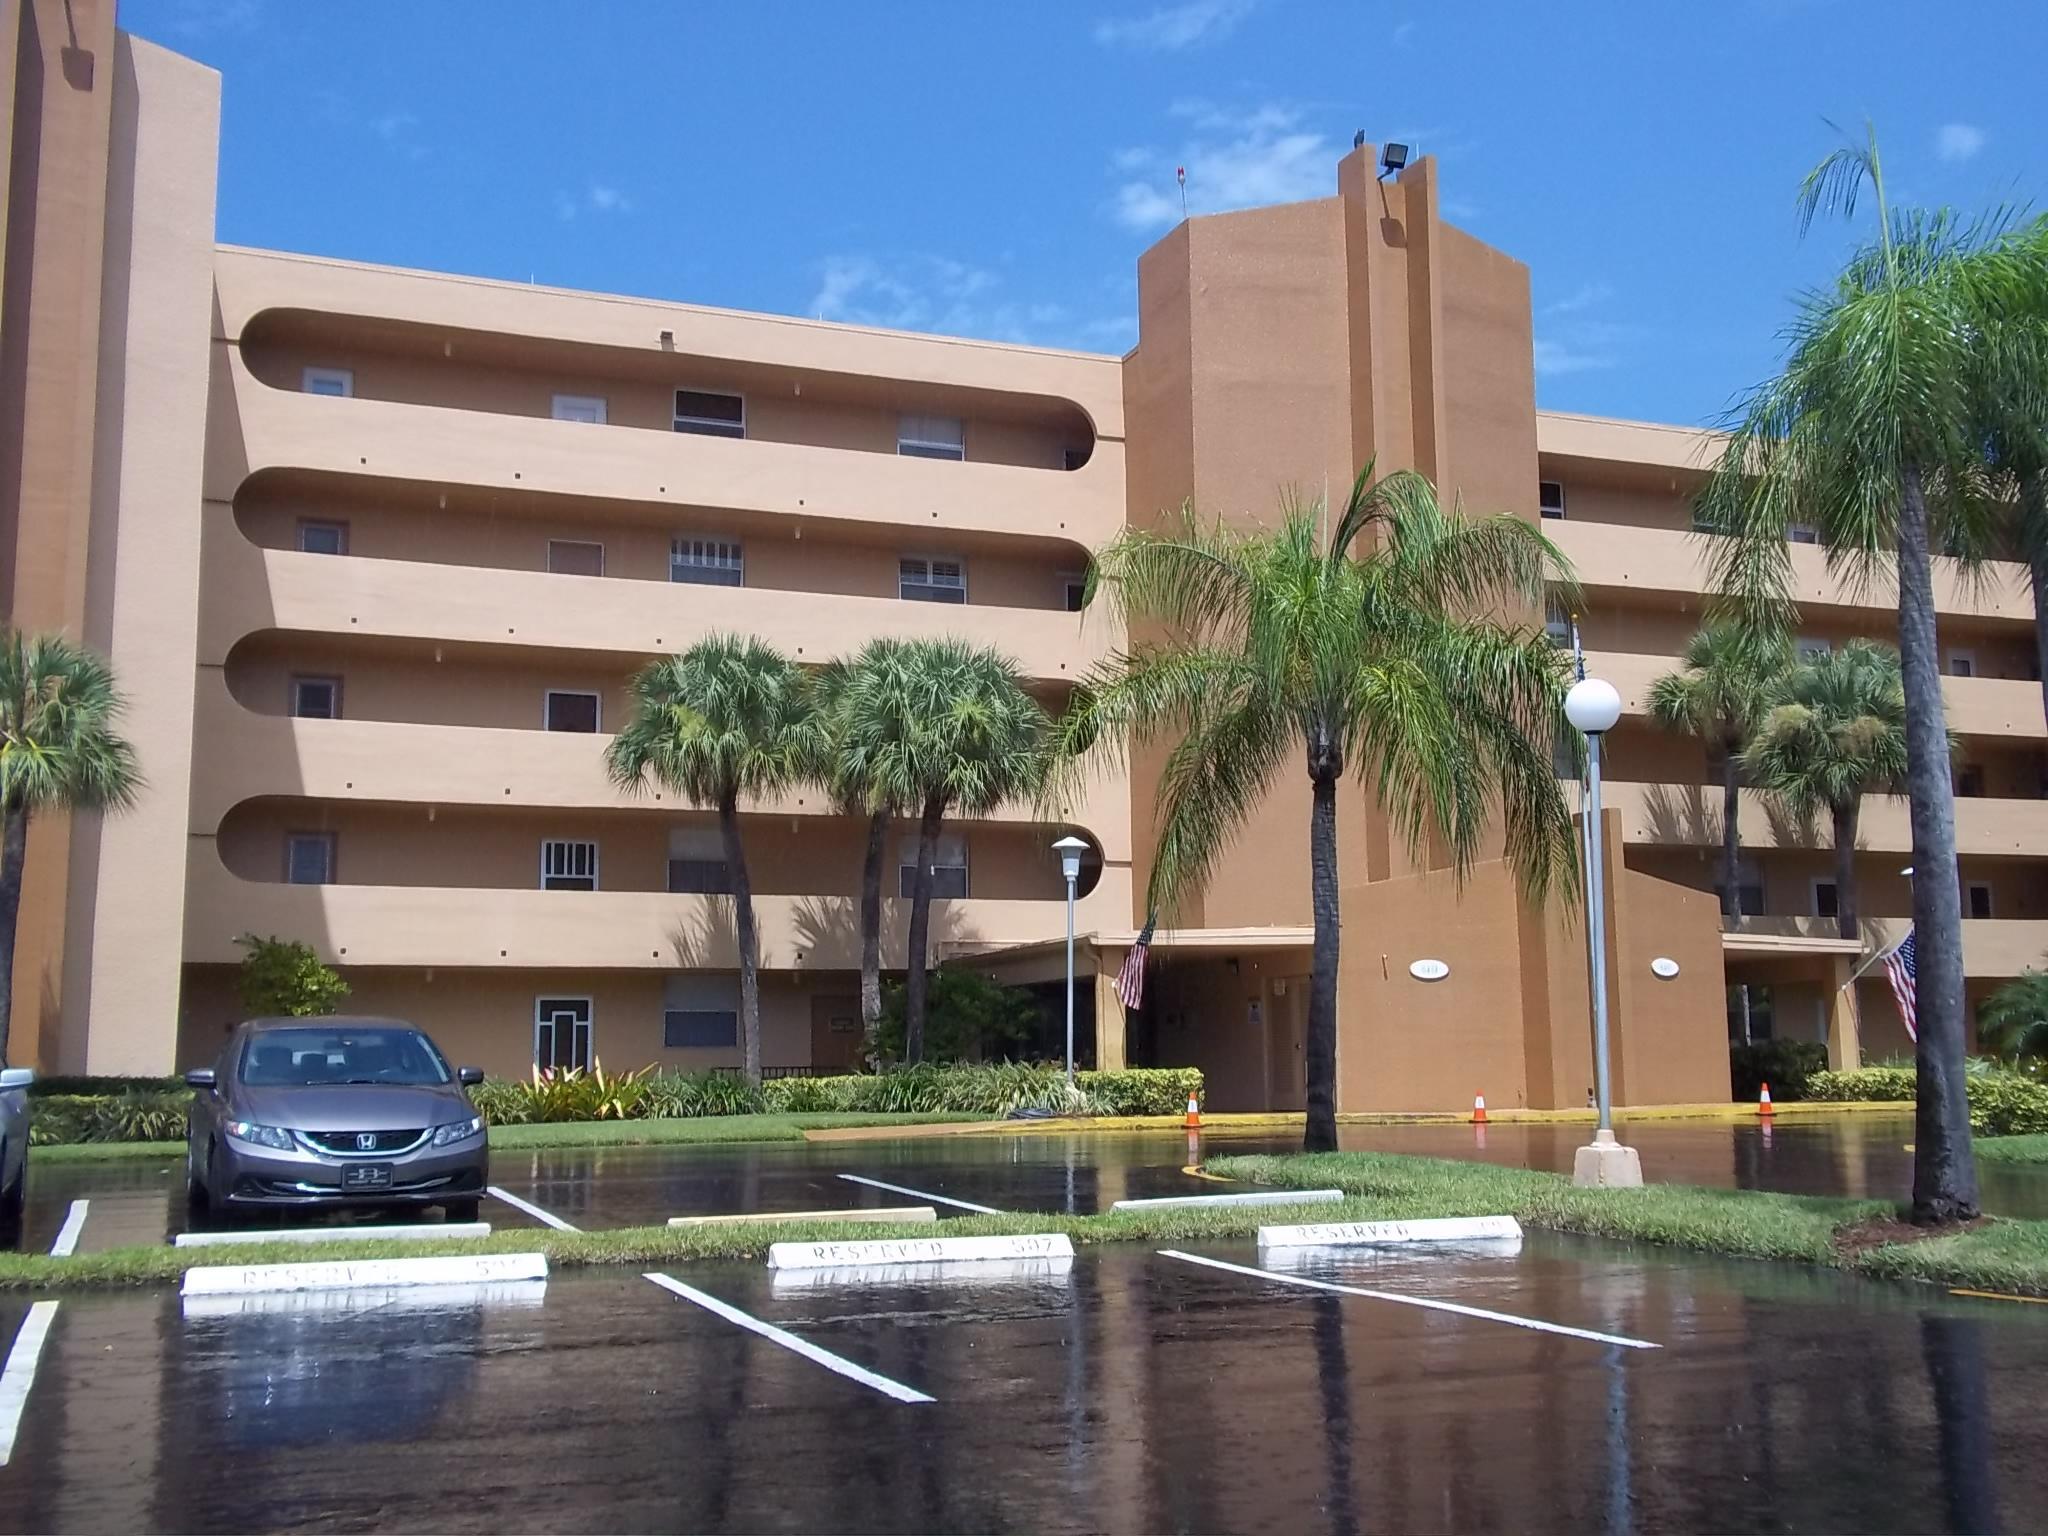 6461 Nw 2nd Avenue #304 Boca Raton, FL 33487